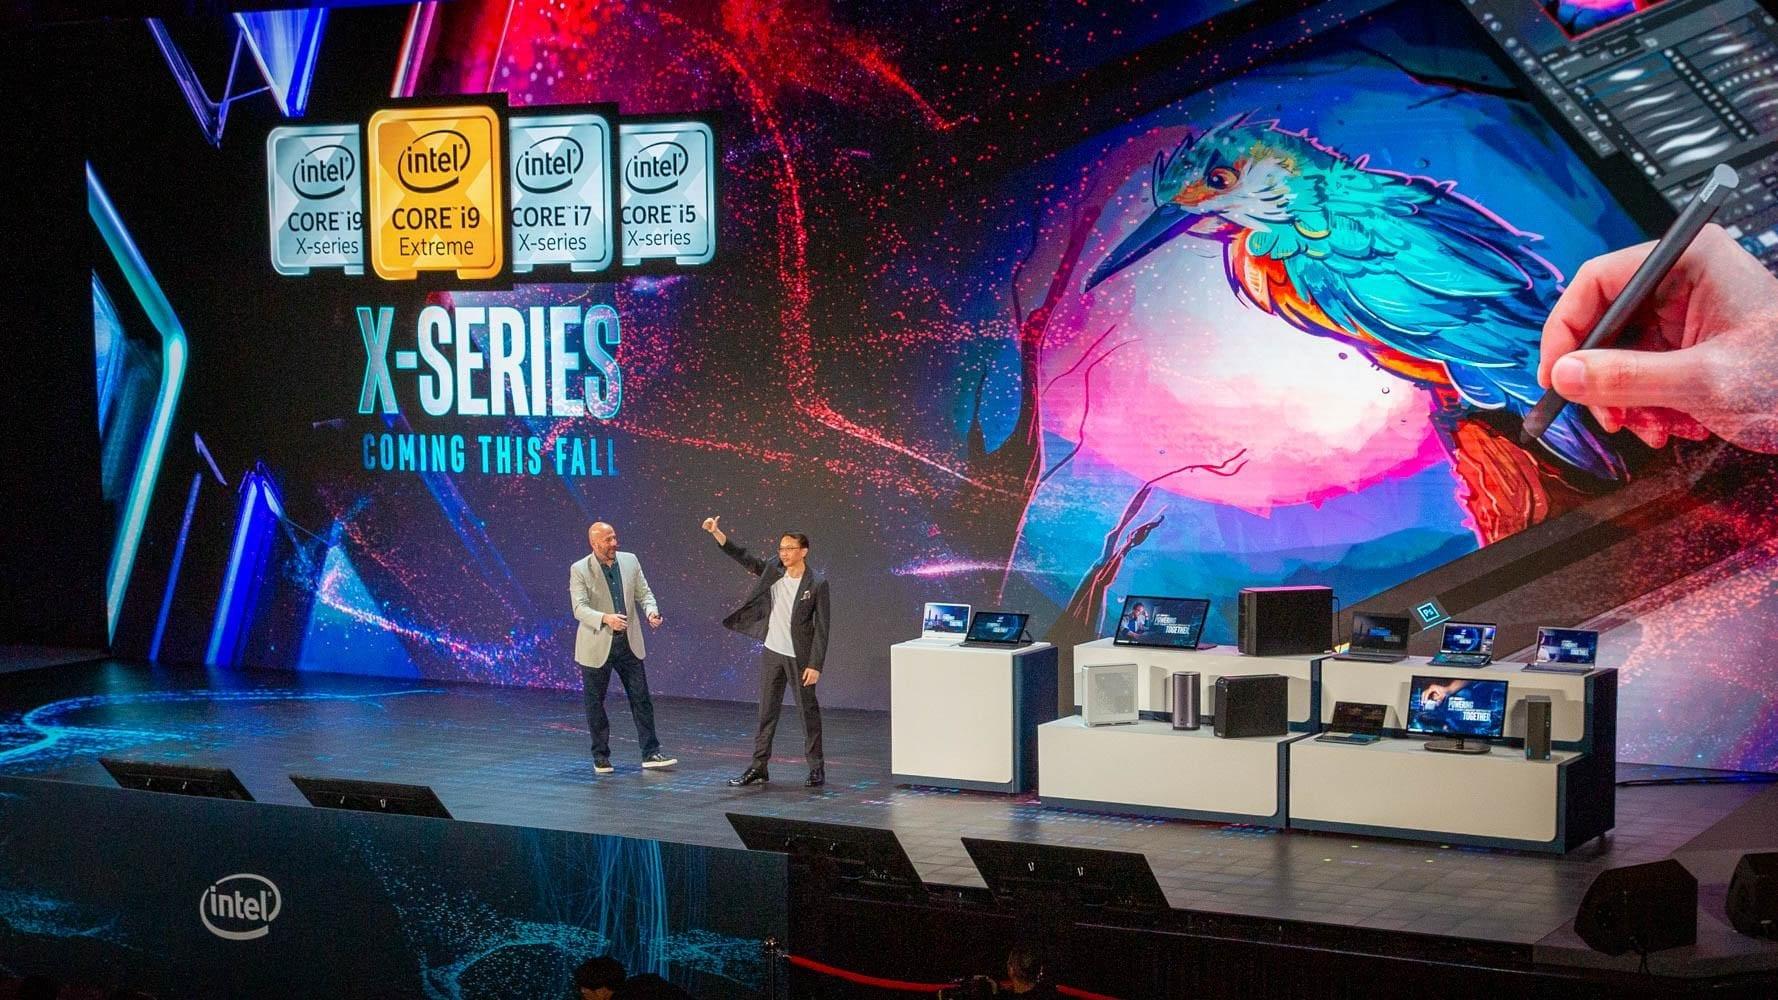 7 октября AMD анонсирует видеокарту Radeon RX 5500